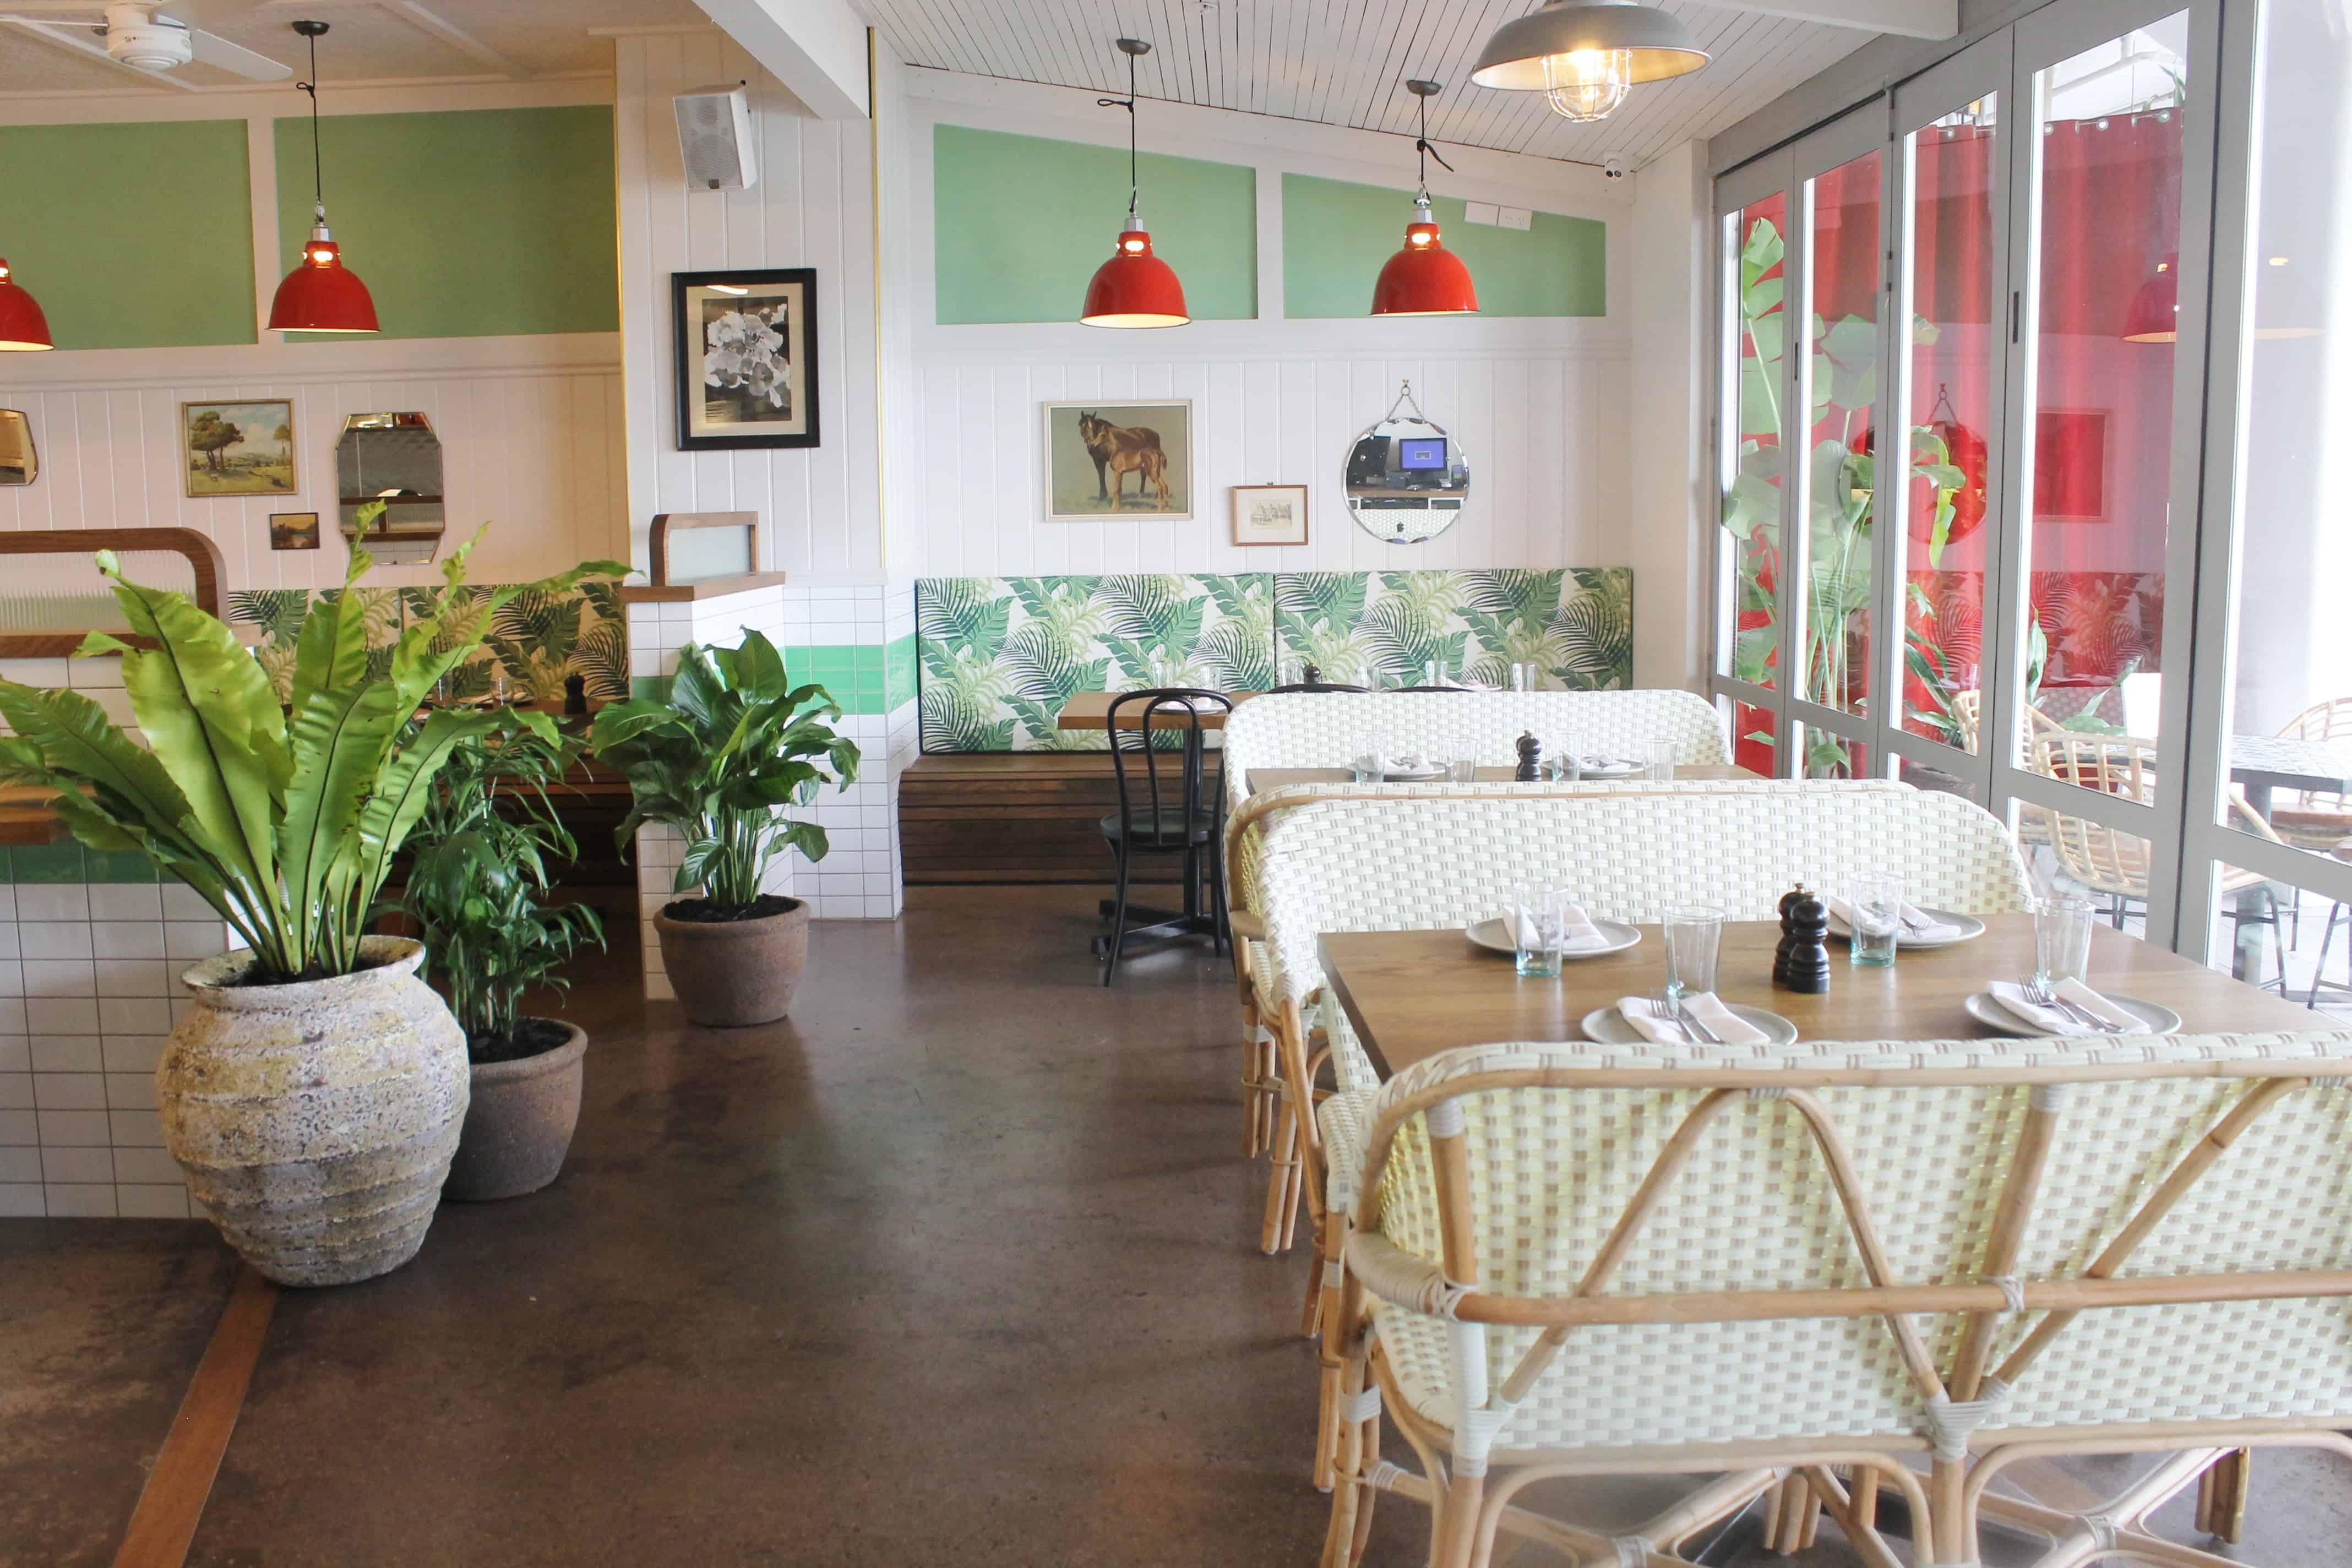 Culpepper restaurant in Auckland dining room design